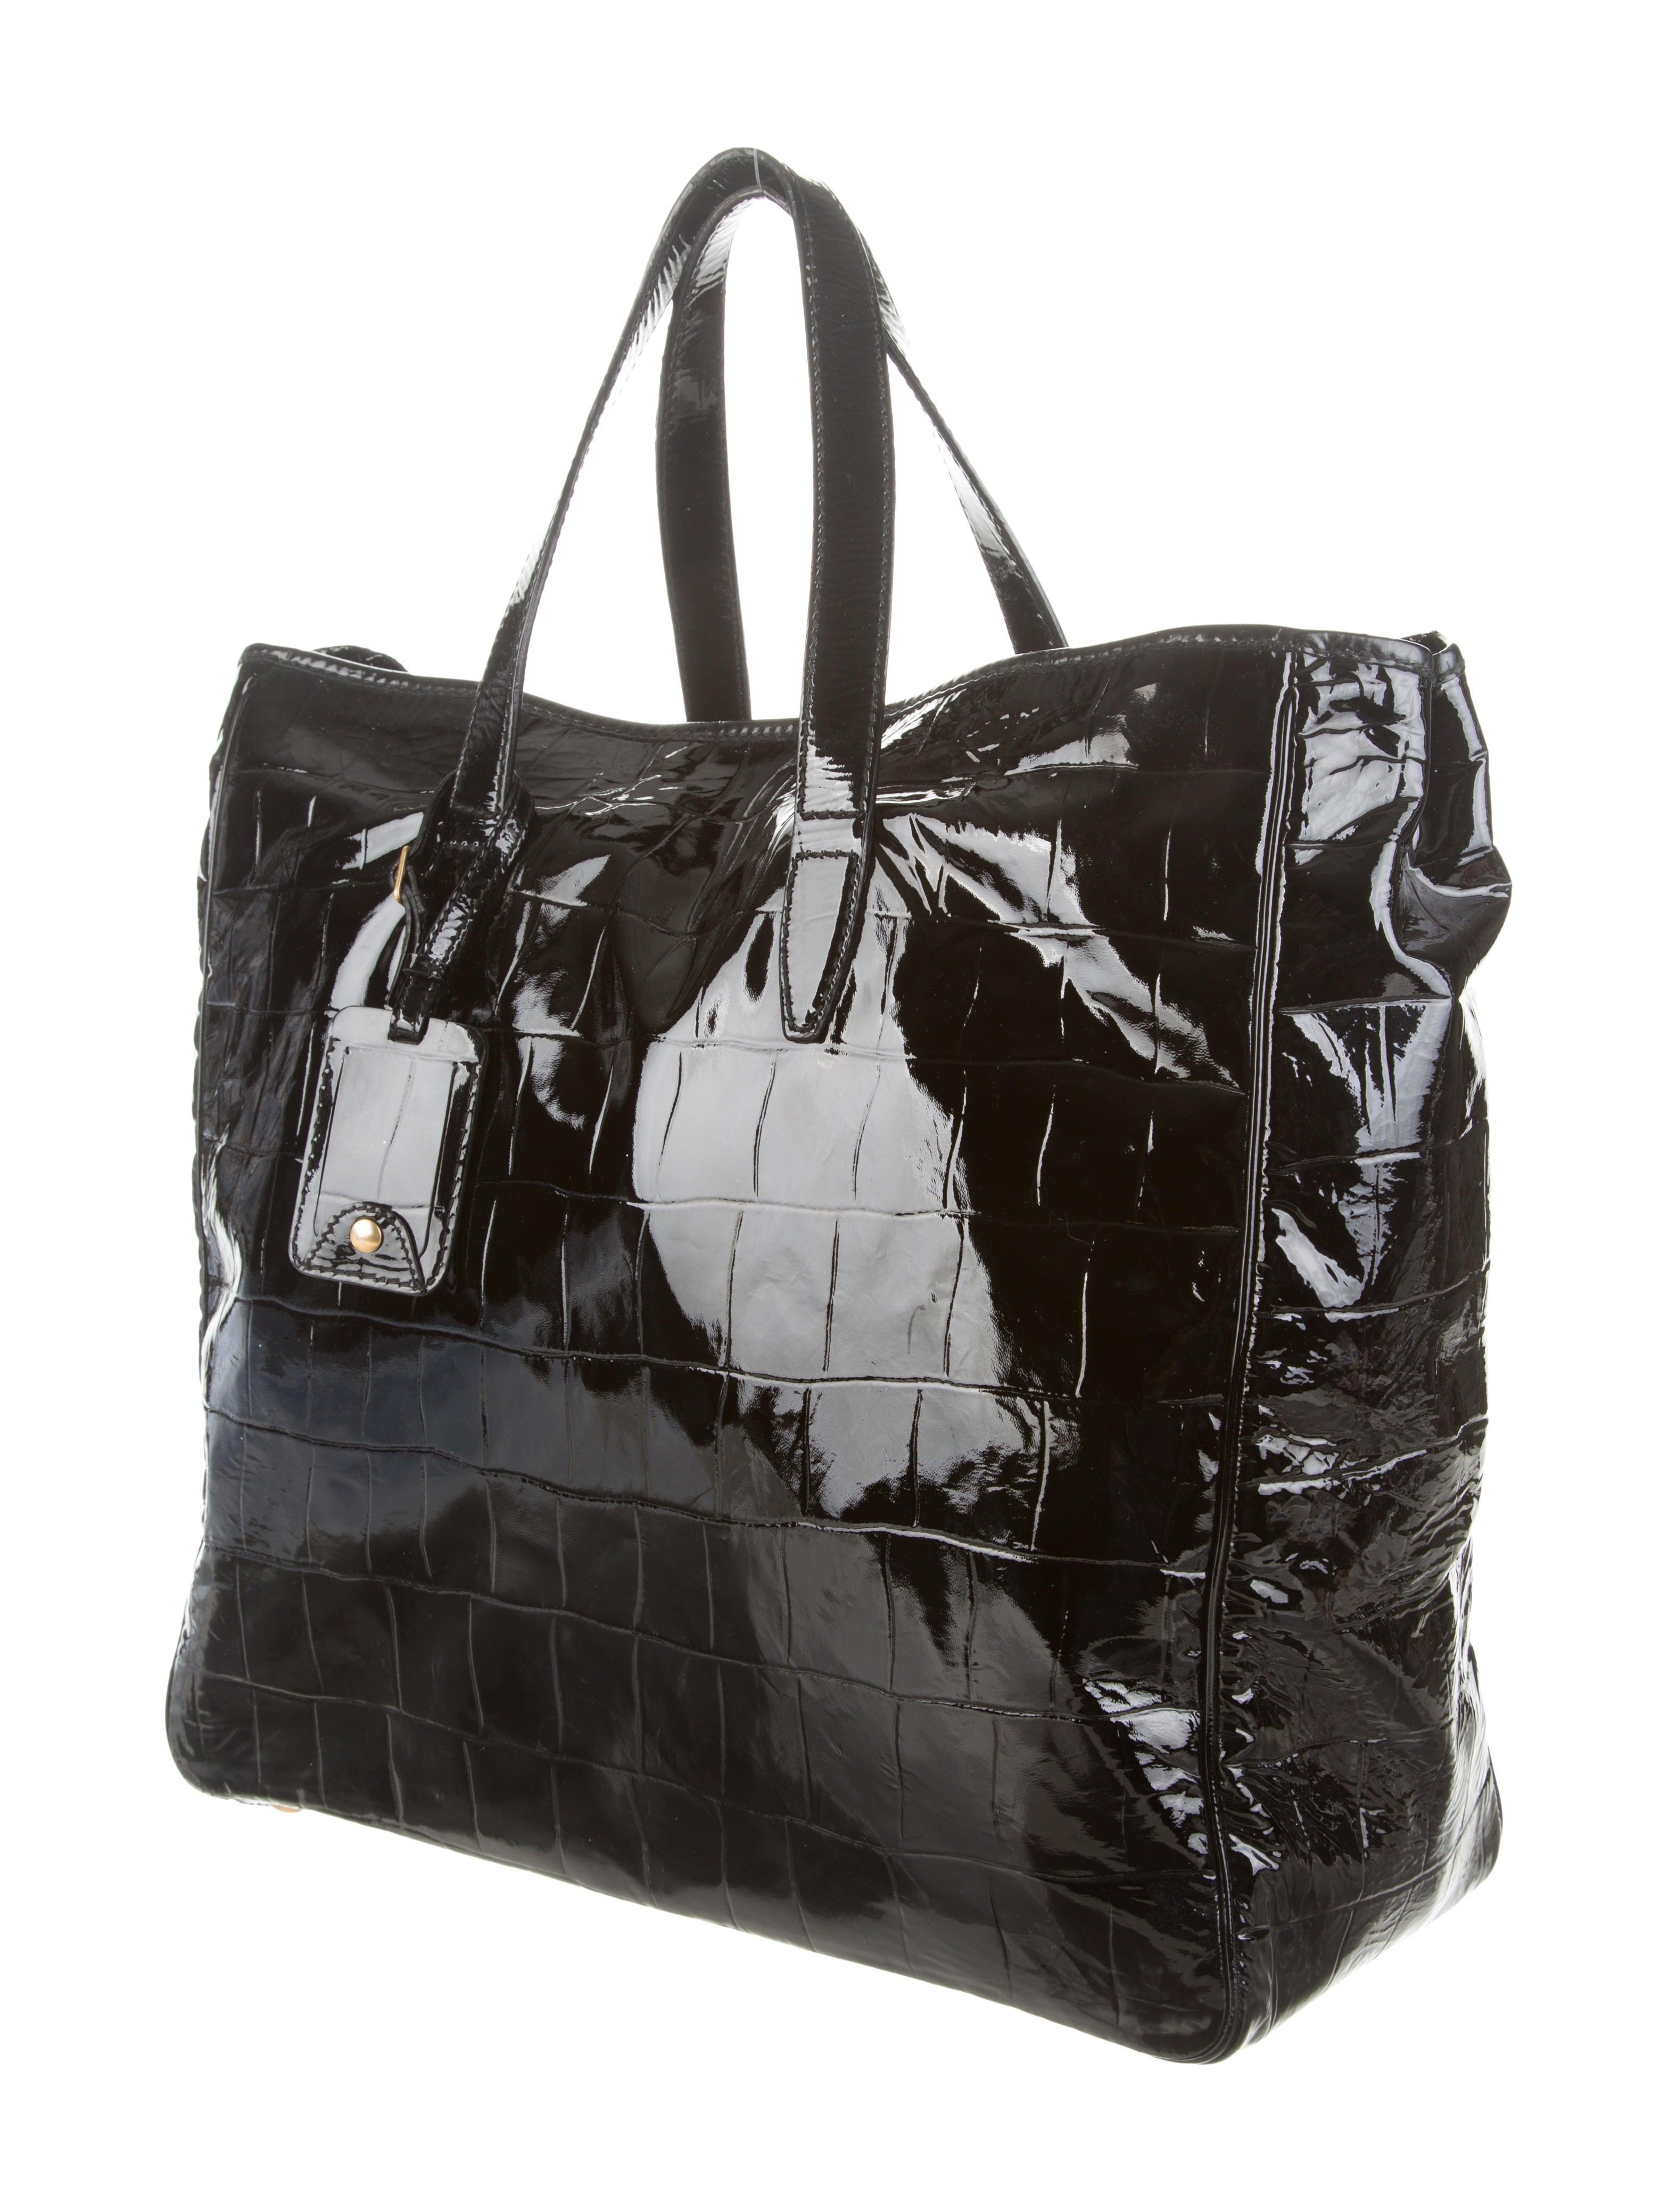 ysl cabas price - Yves Saint Laurent Raspail Tote - Handbags - YVE37752 | The RealReal